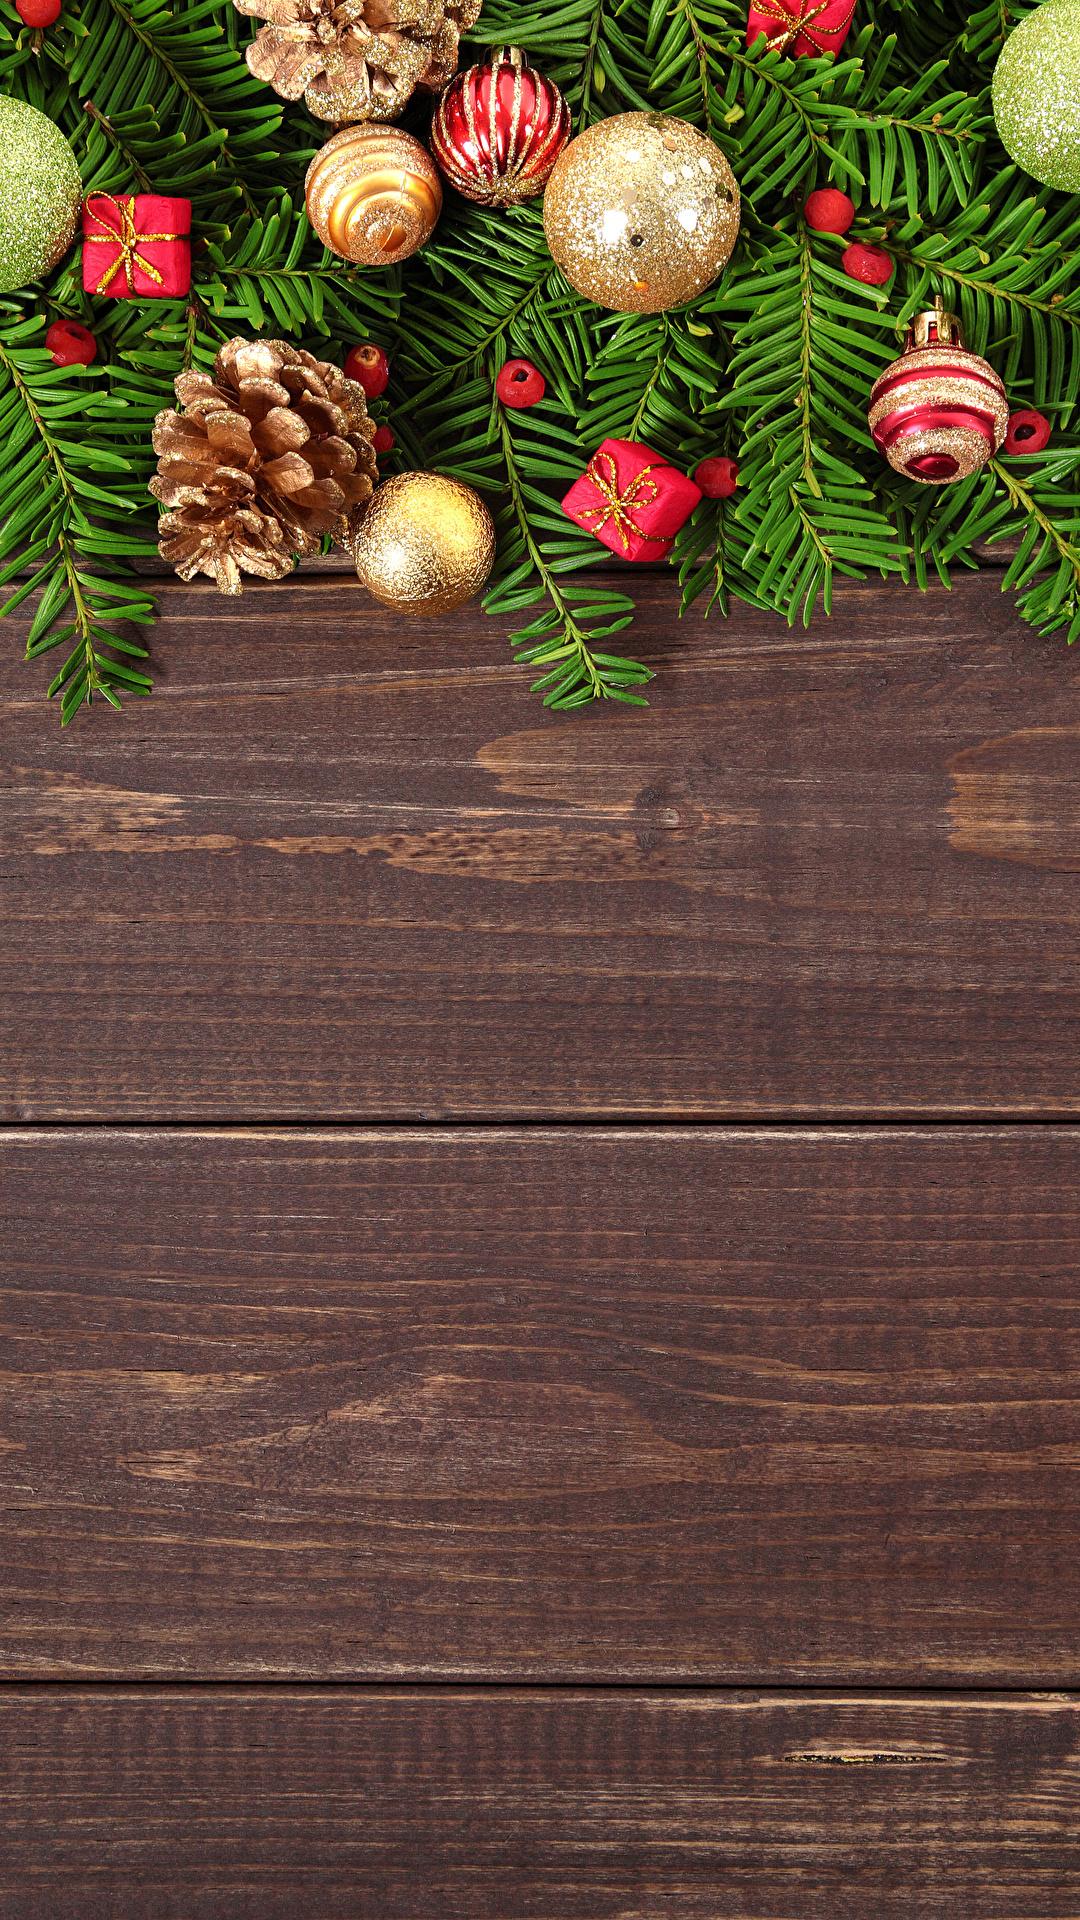 Картинка Рождество Шар шишка Доски 1080x1920 Новый год Шишки Шарики